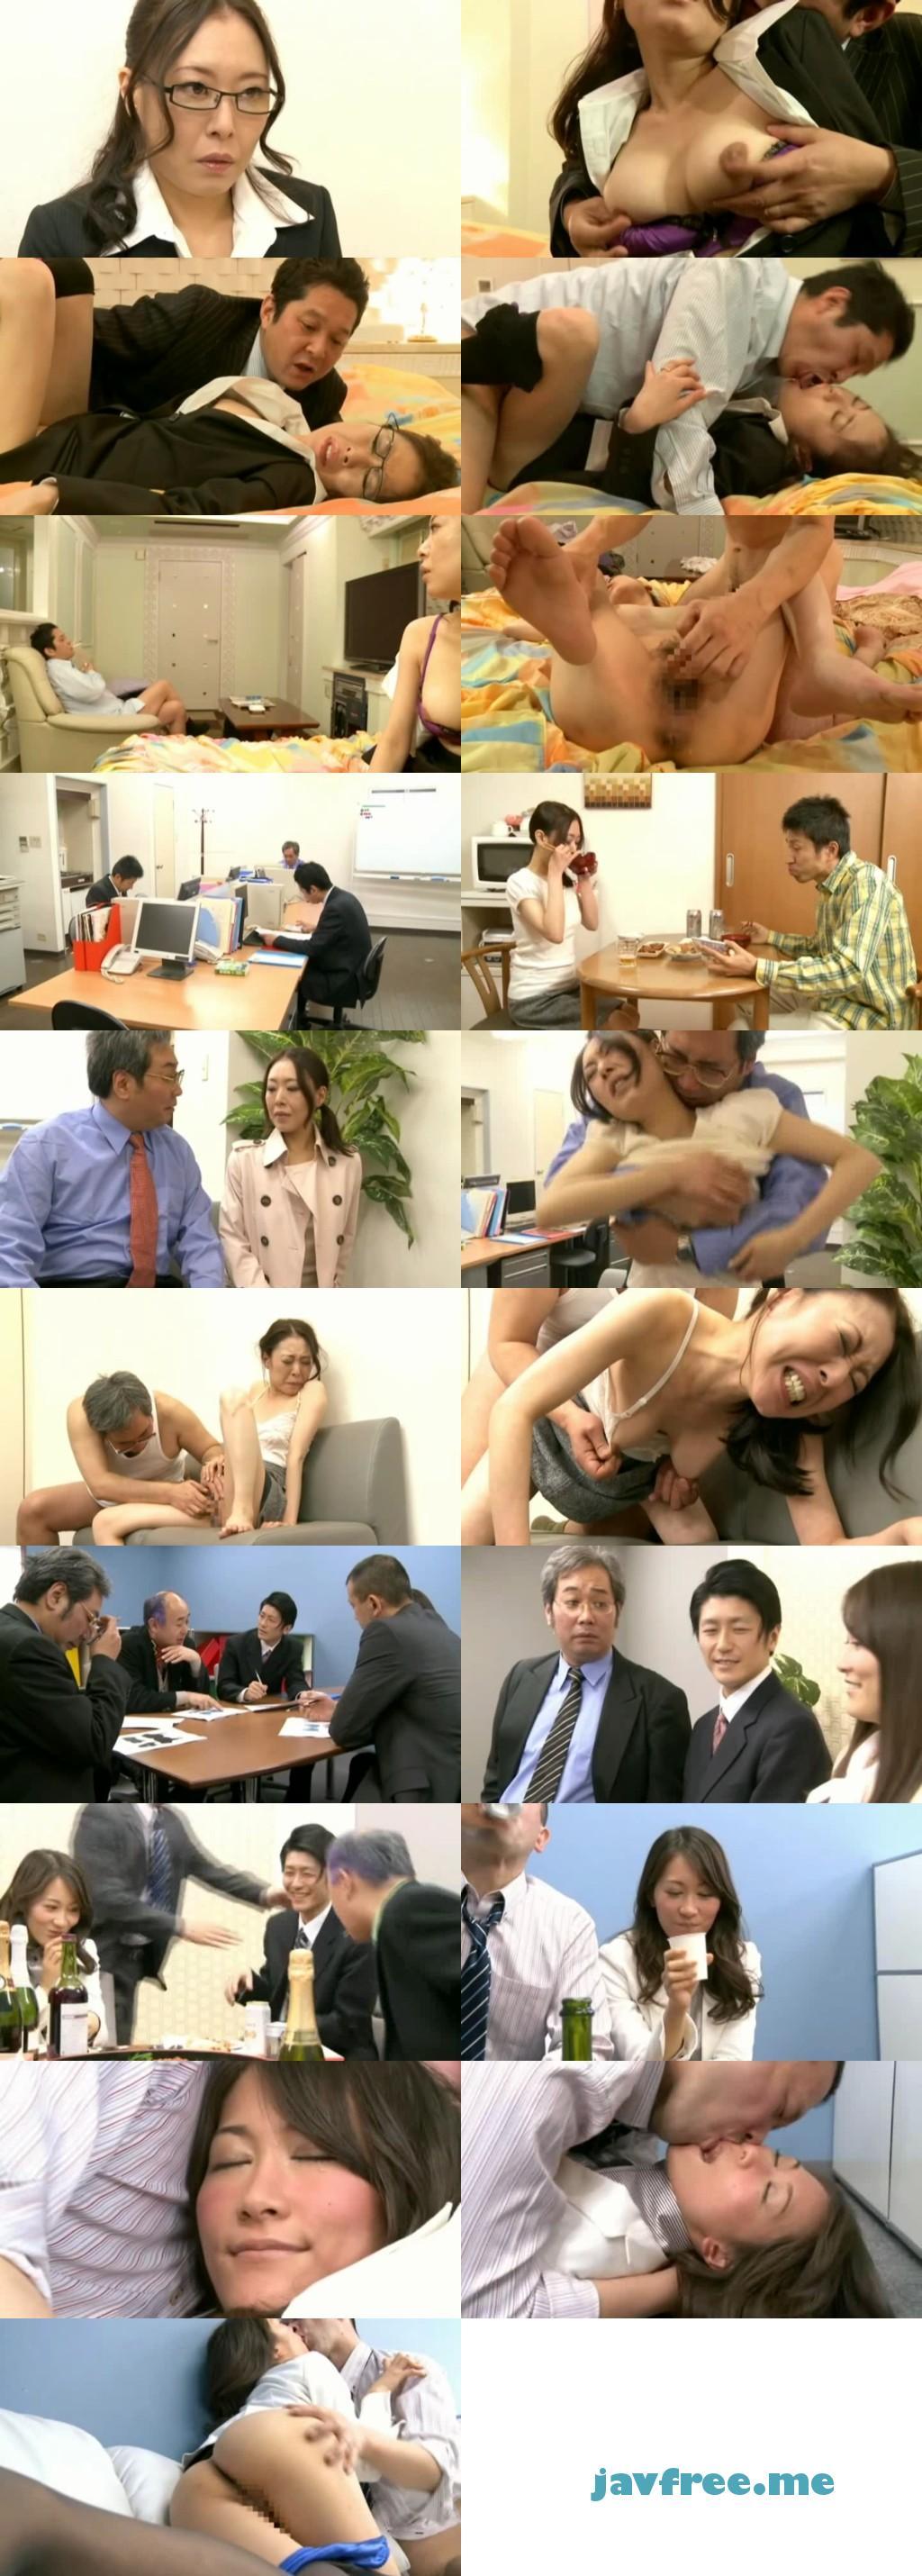 [NSPS-167] 祝職場結婚 フィアンセが同僚たちに寝取られた。 - image nsps-167 on https://javfree.me